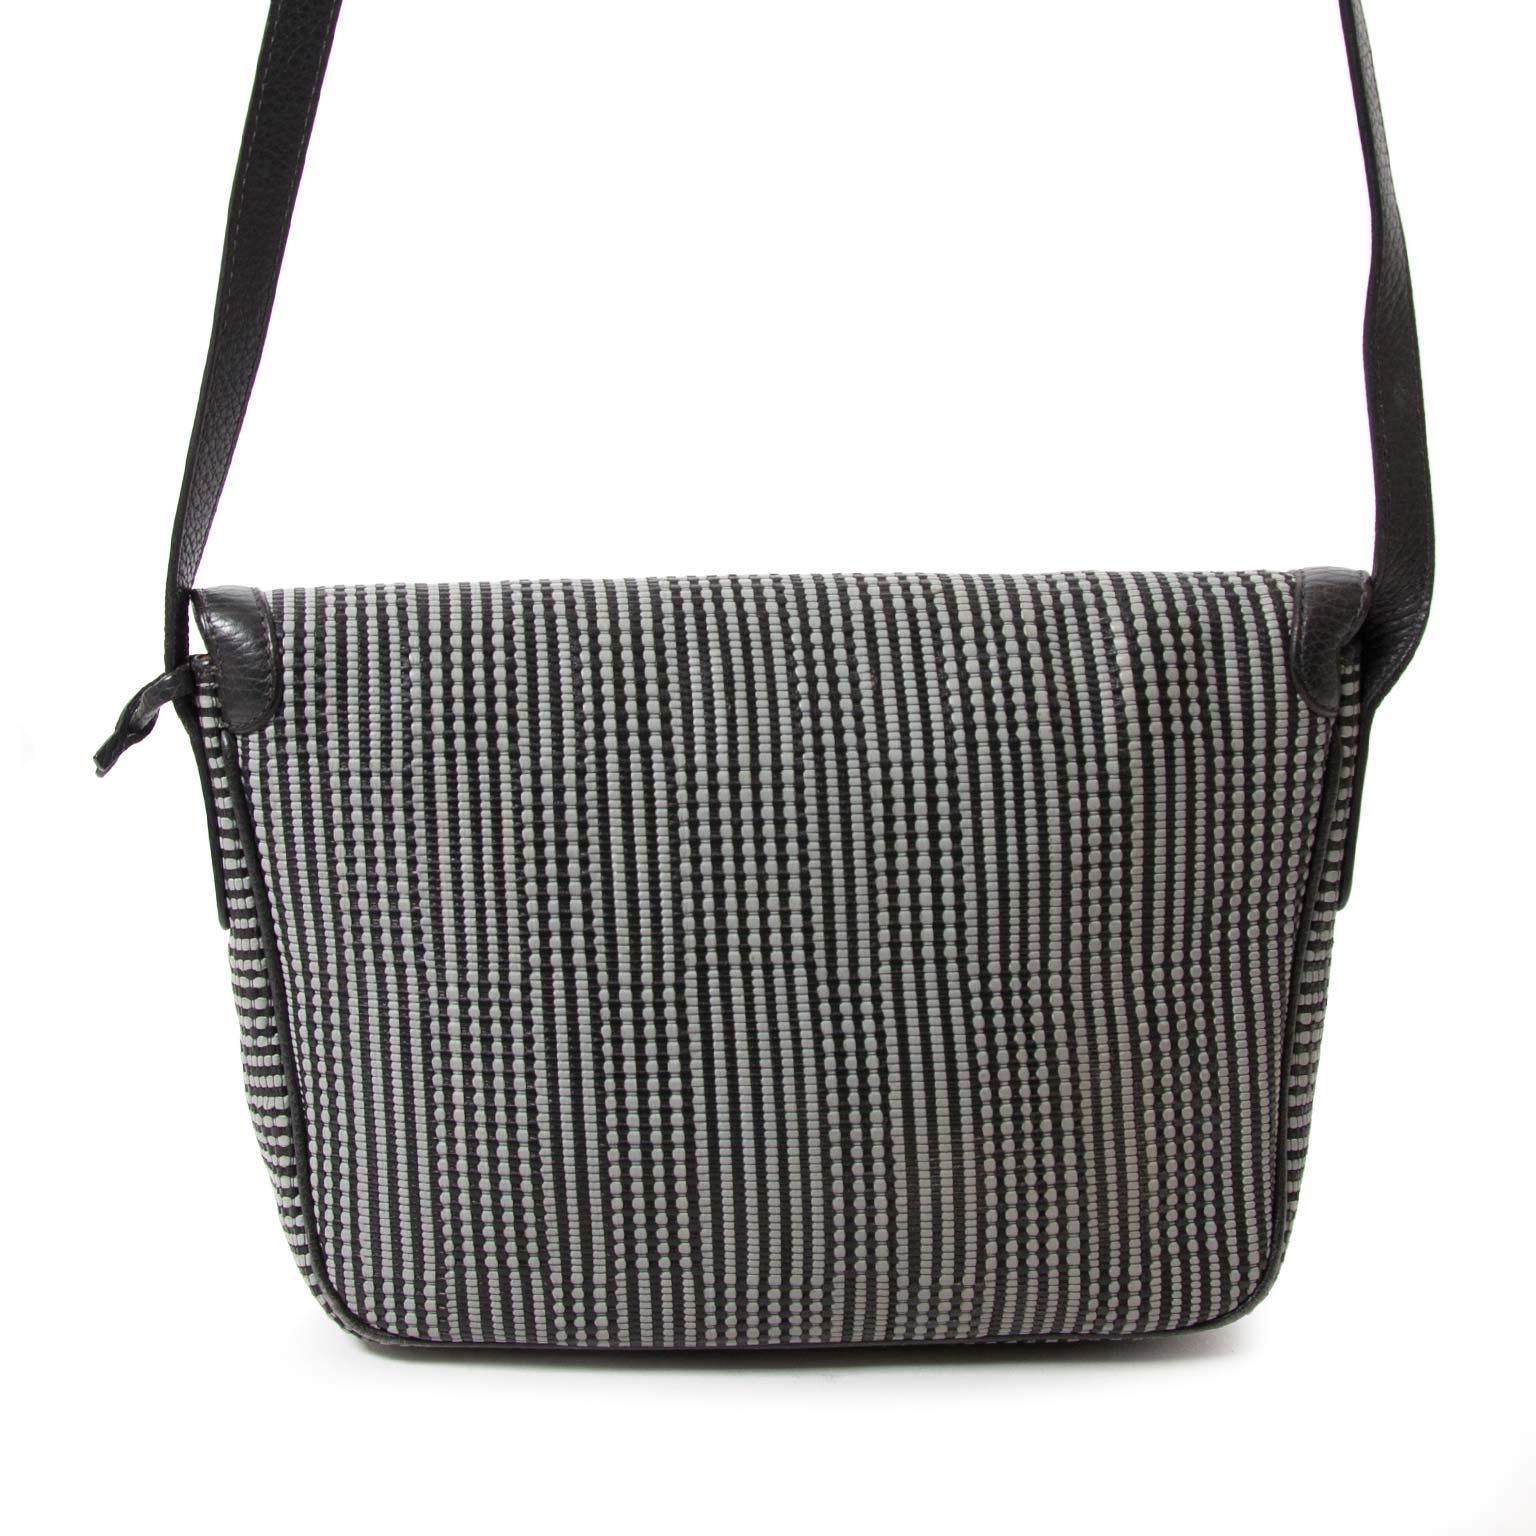 achetez Delvaux Grey Toile De Cuir Cross Body Bag chez labellov.com